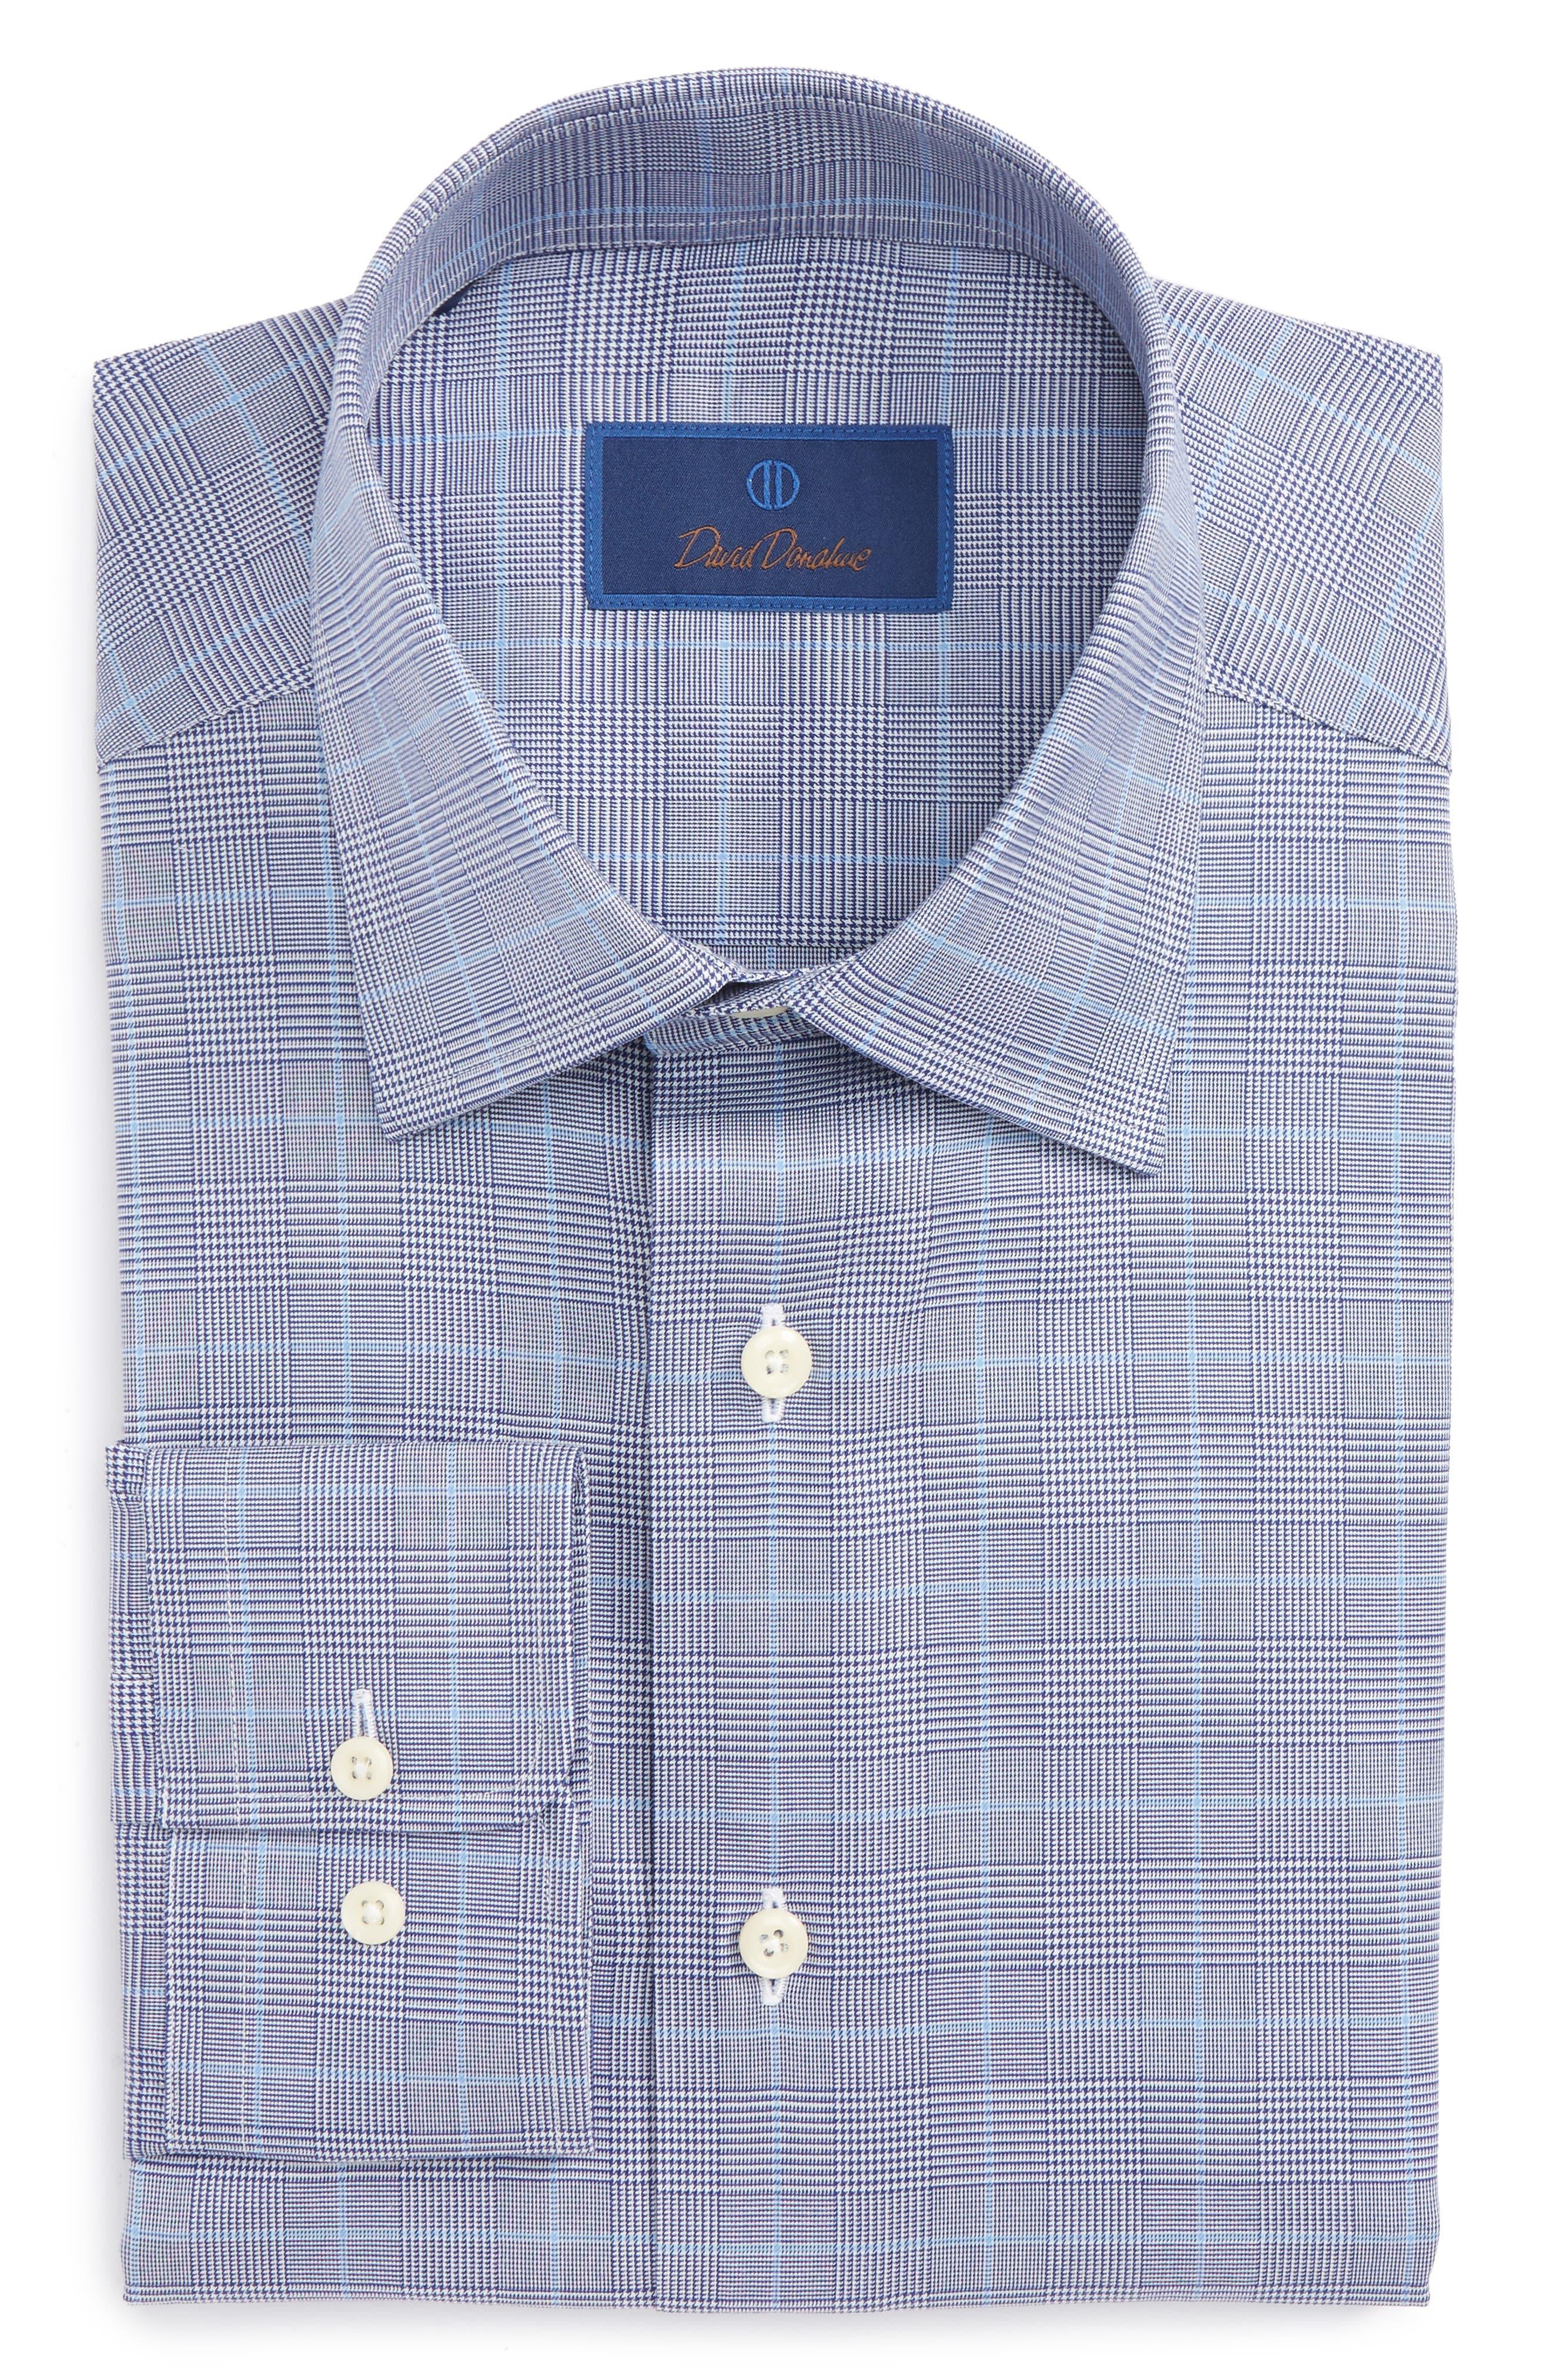 Regular Fit Plaid Dress Shirt,                             Main thumbnail 1, color,                             412